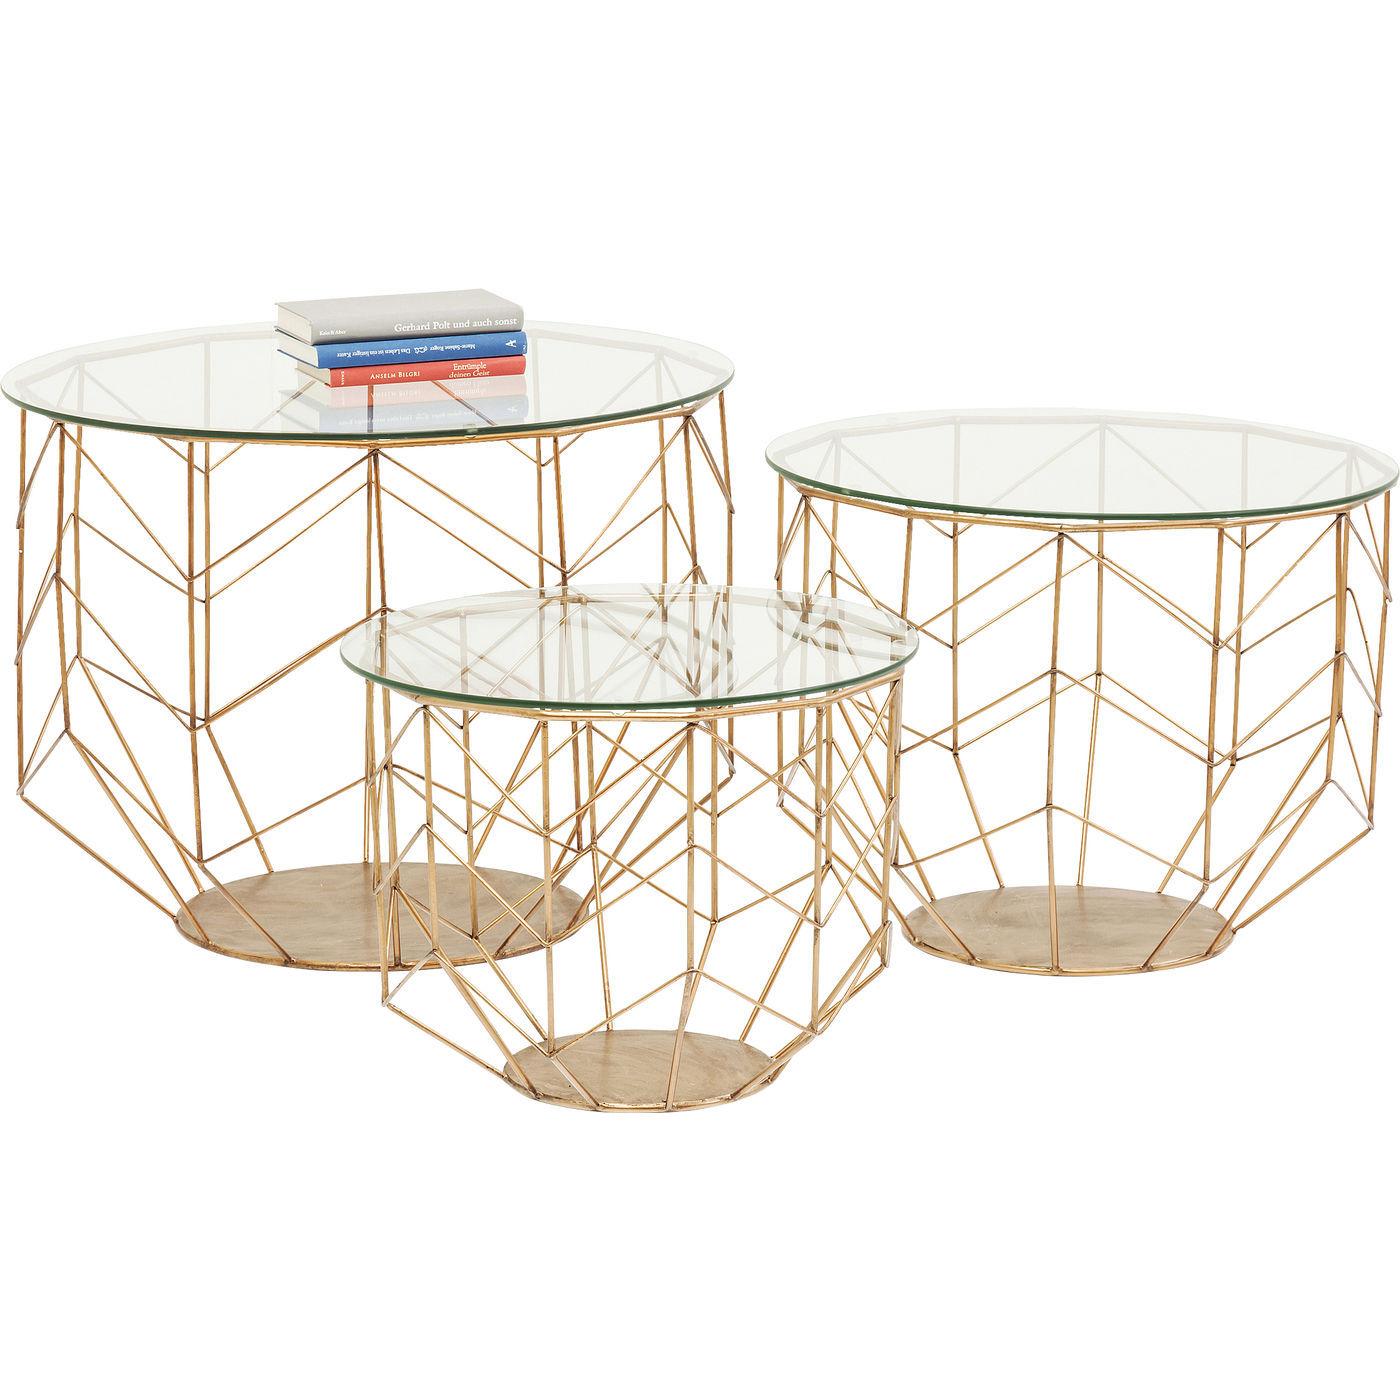 KARE DESIGN Wire Grid Brass sofabord - glasplade og messing, rund (st m. 3)